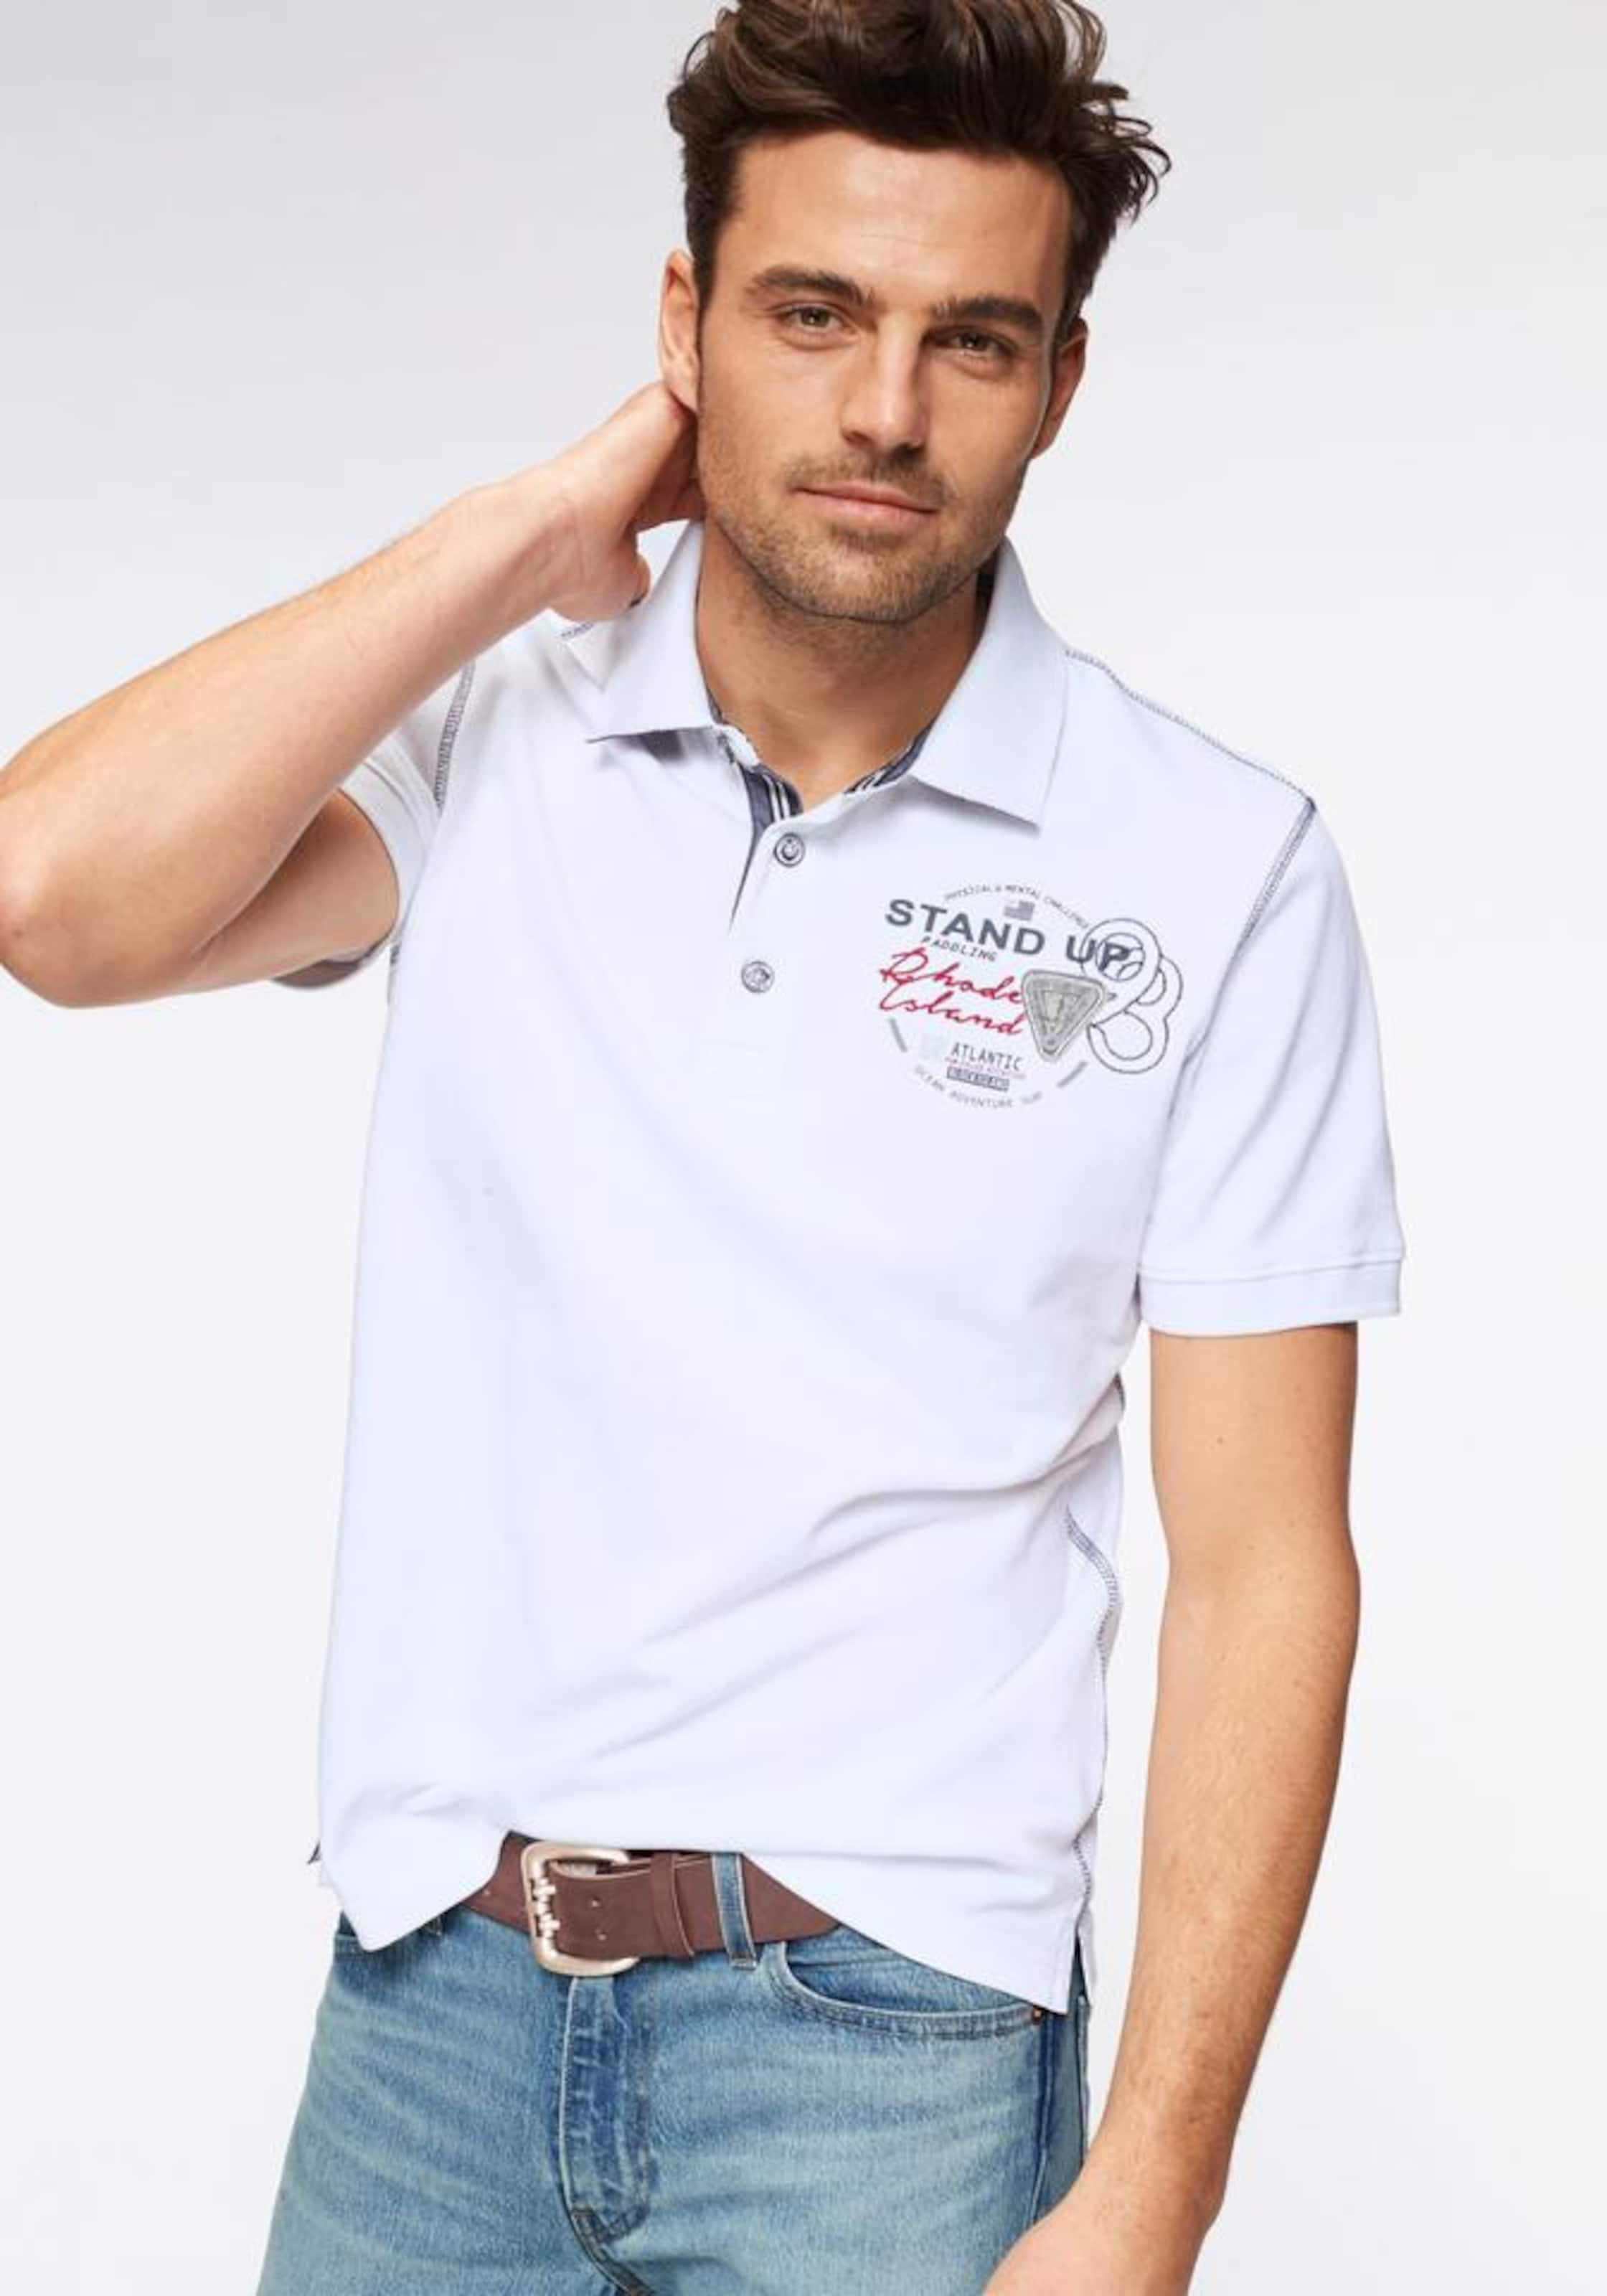 Rhode Rhode In Island Poloshirt MischfarbenWeiß In Rhode Island MischfarbenWeiß Poloshirt Poloshirt Island 4A5LRj